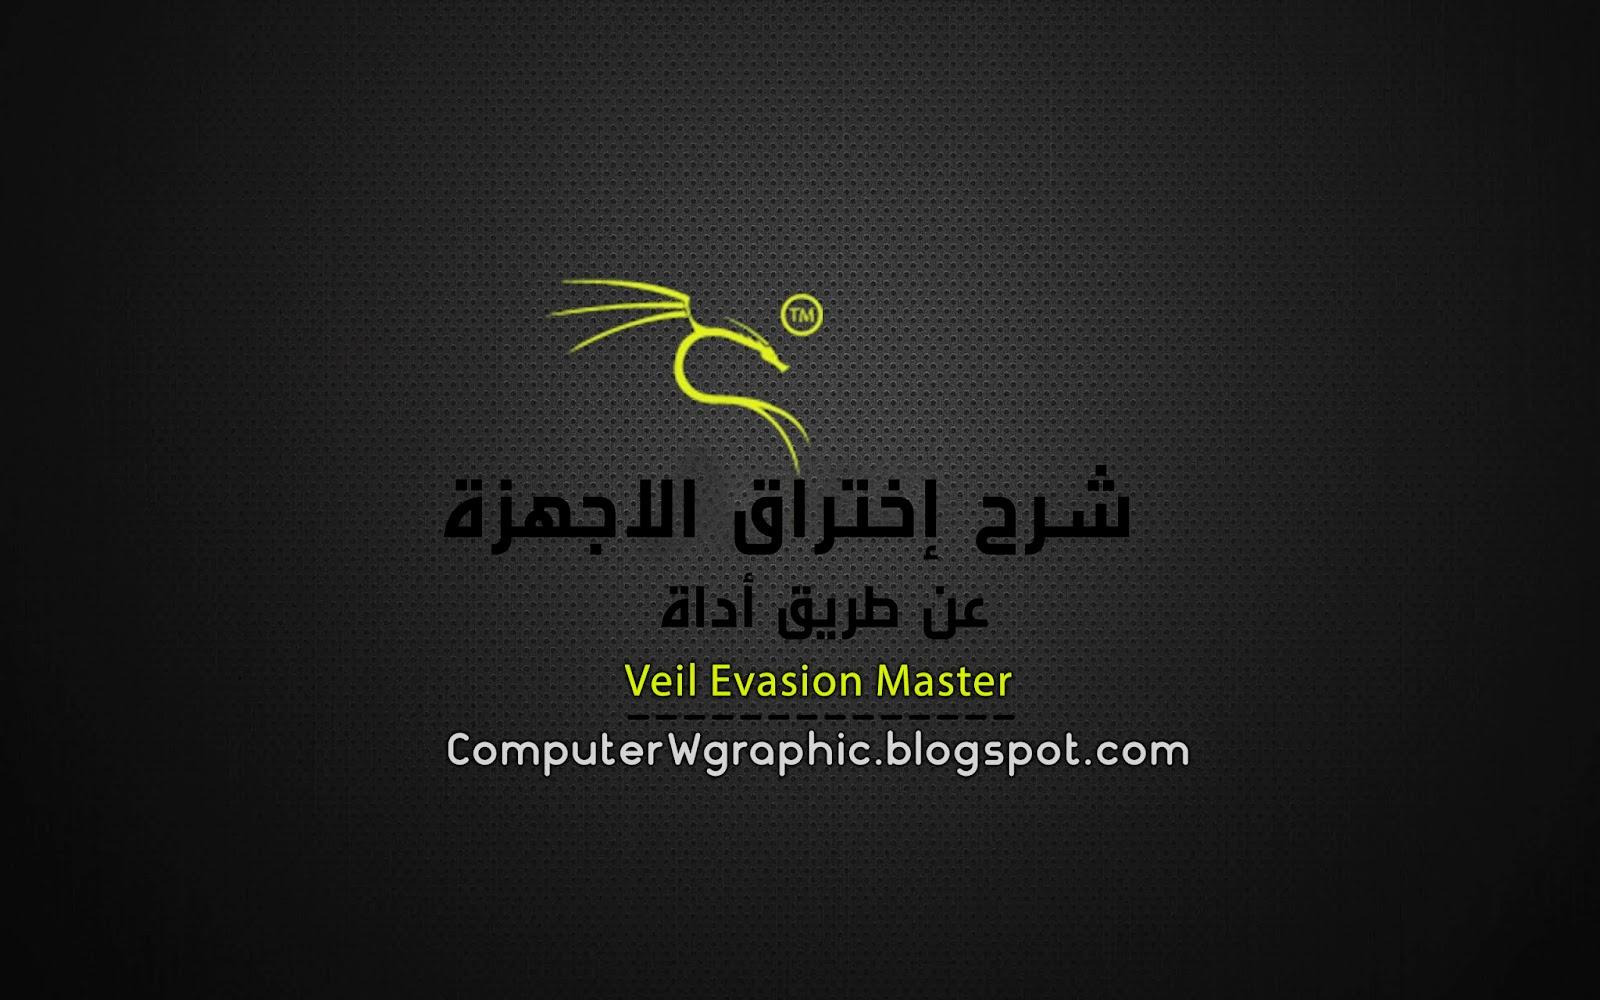 Veil Evasion Master